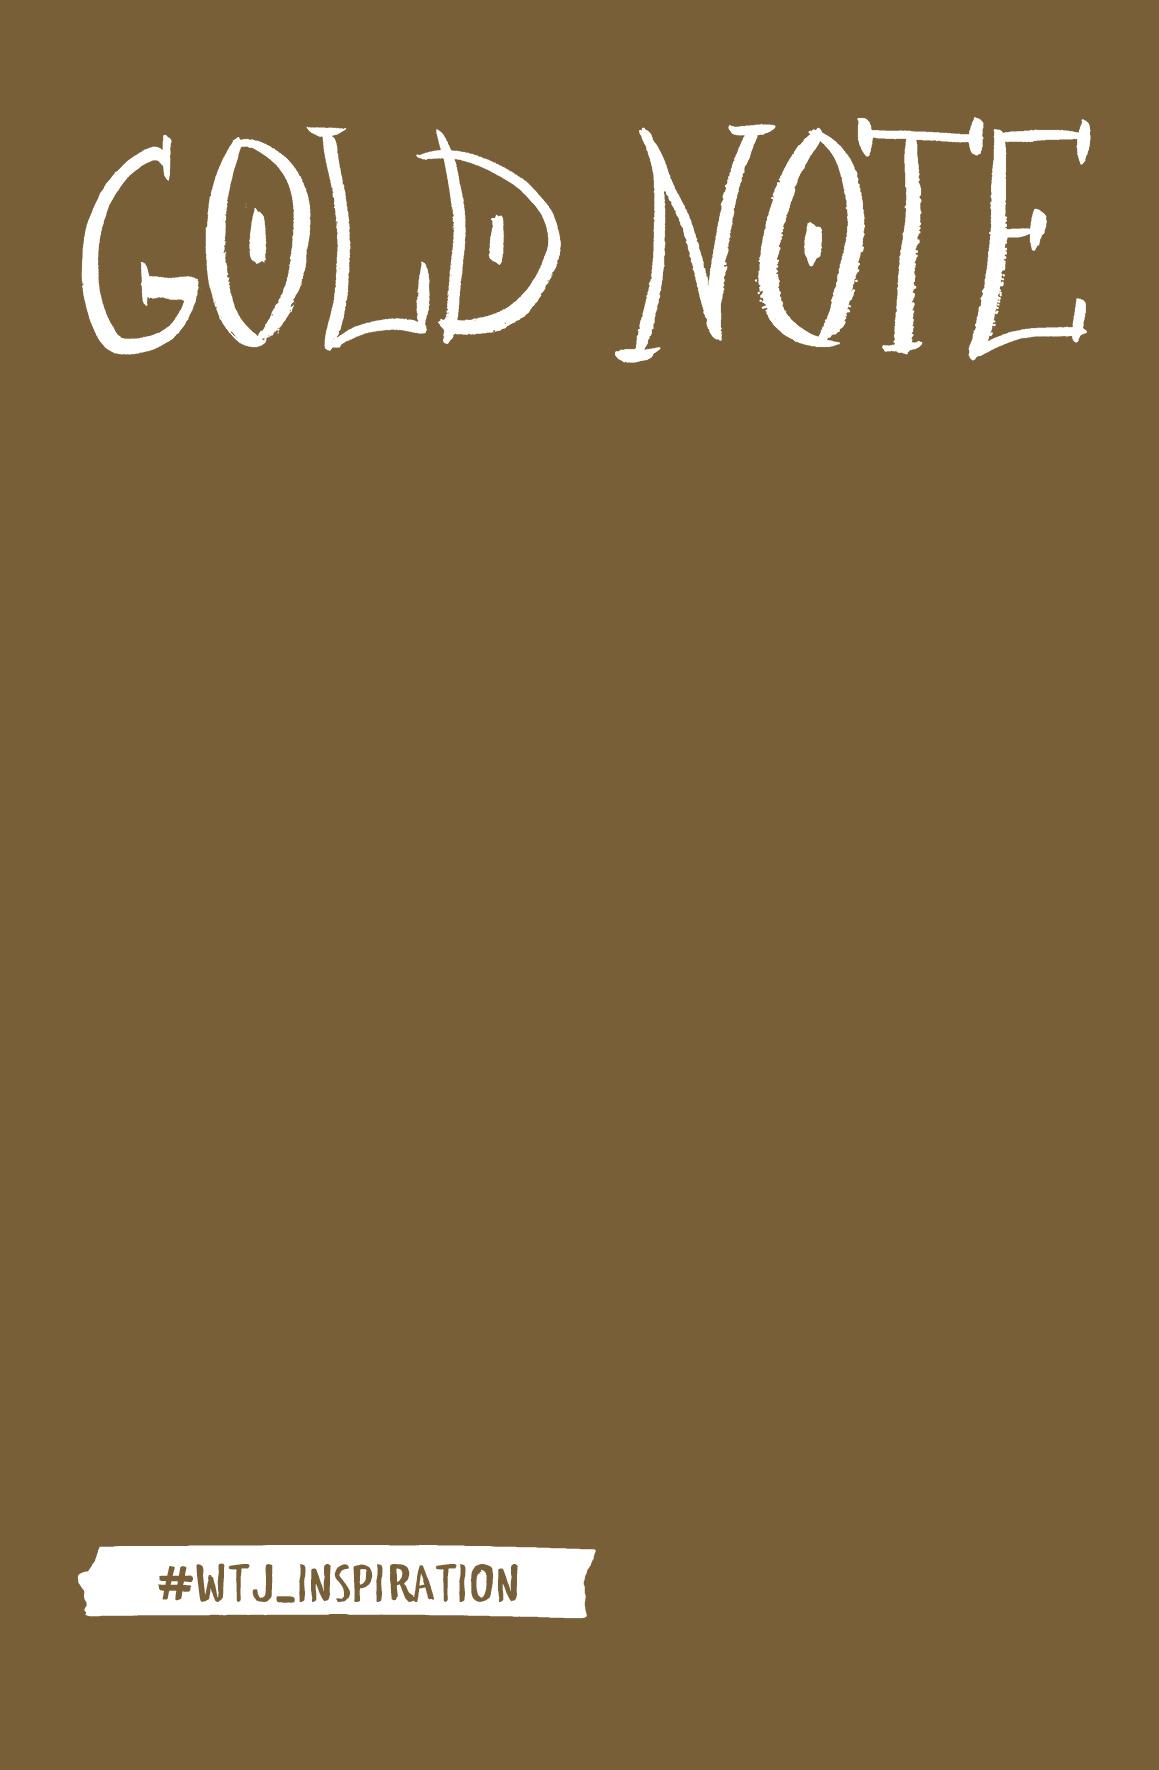 Gold Note. Креативный блокнот с золотыми страницами (мягкая обложка) silver note креативный блокнот с серебряными страницами мяг обл а5 192 стр